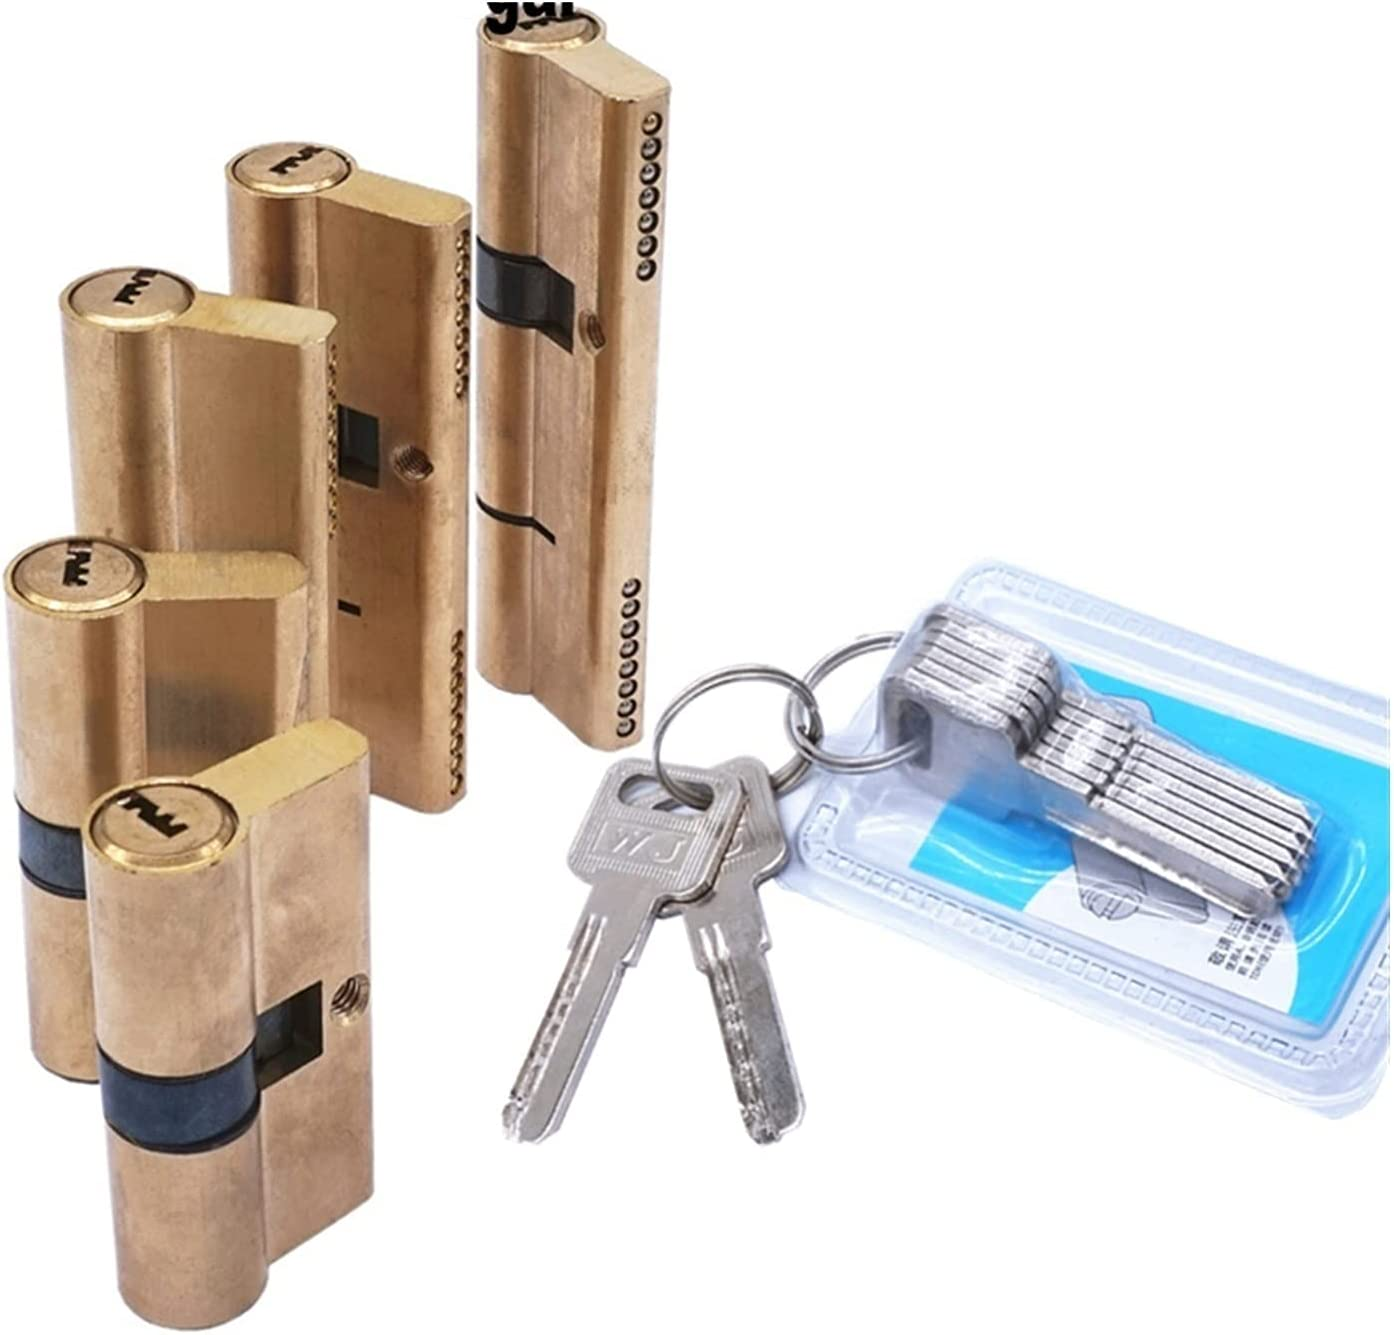 Lock Cylinder Door Biased 65 90 favorite 70 115mm Cylind 80 Soldering